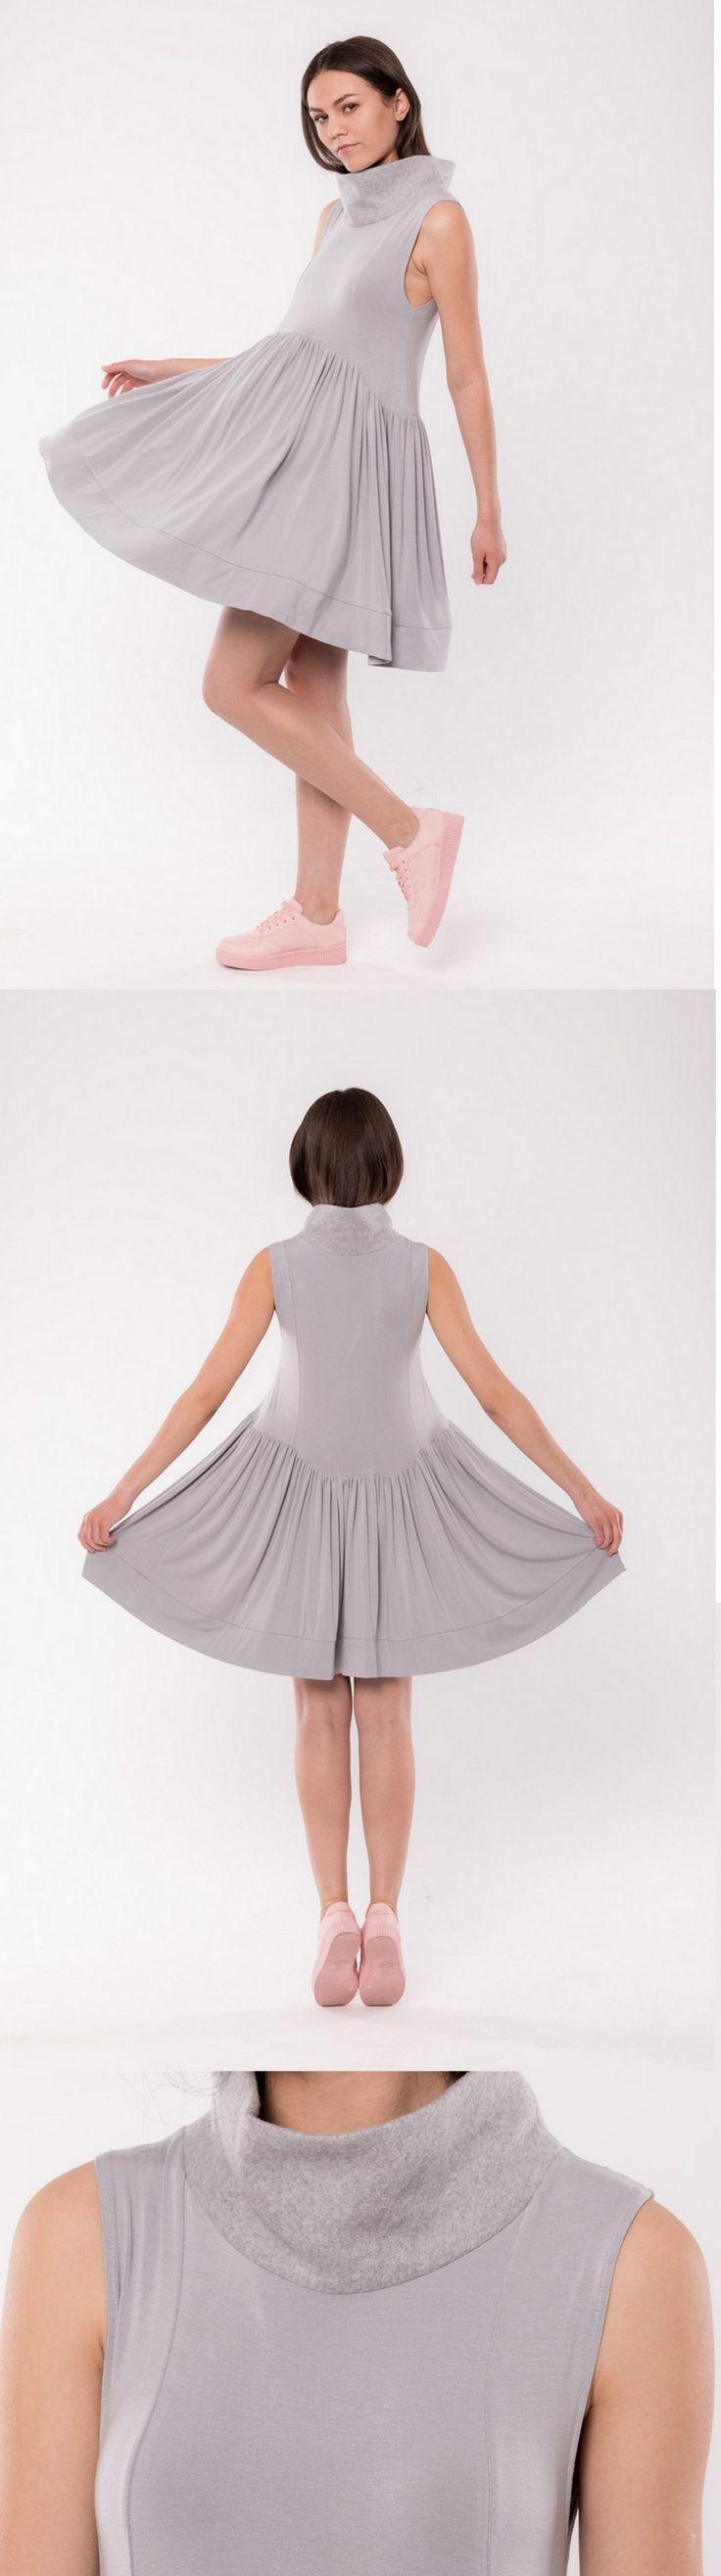 Fludra Slow Fashion knitted dress with fleece collar, designer Anna Fludra